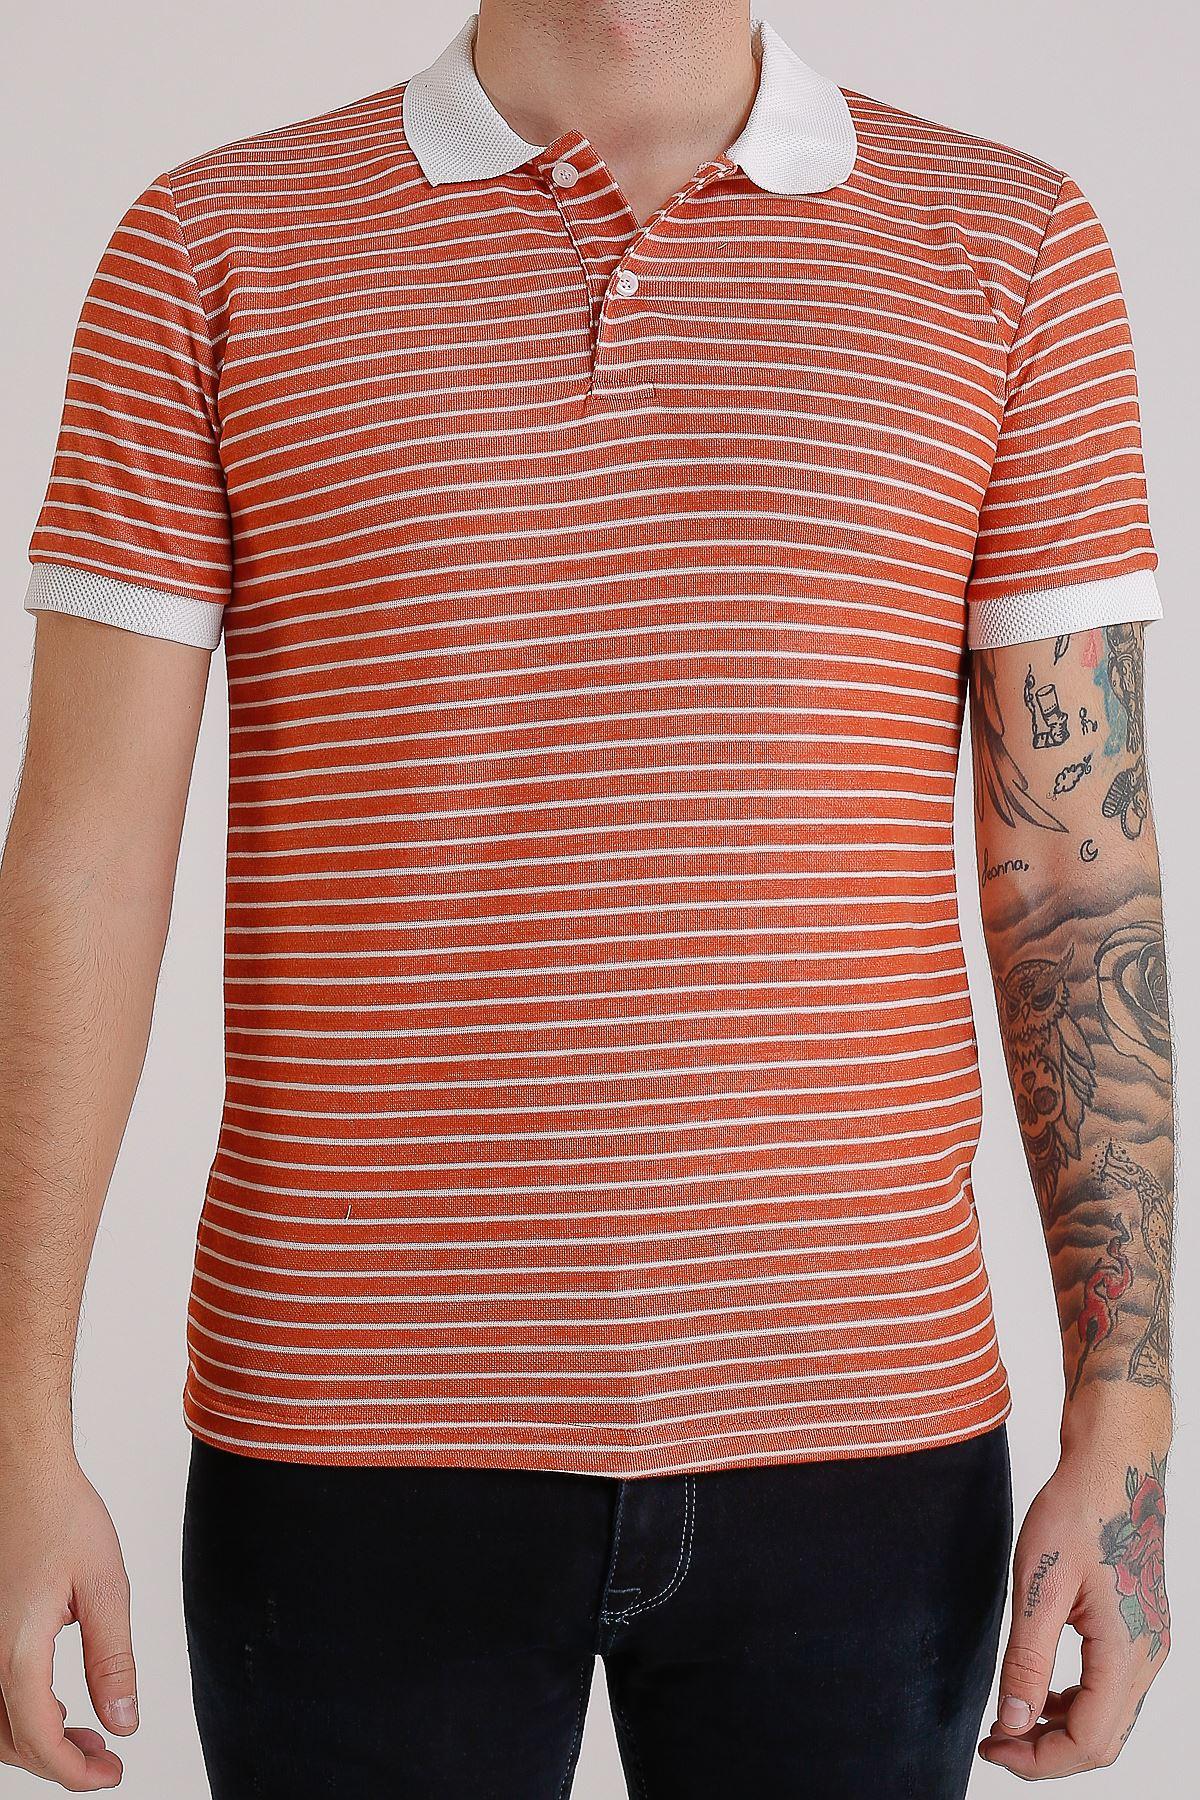 Erkek Polo yaka Çizgili Mercan T-Shirt